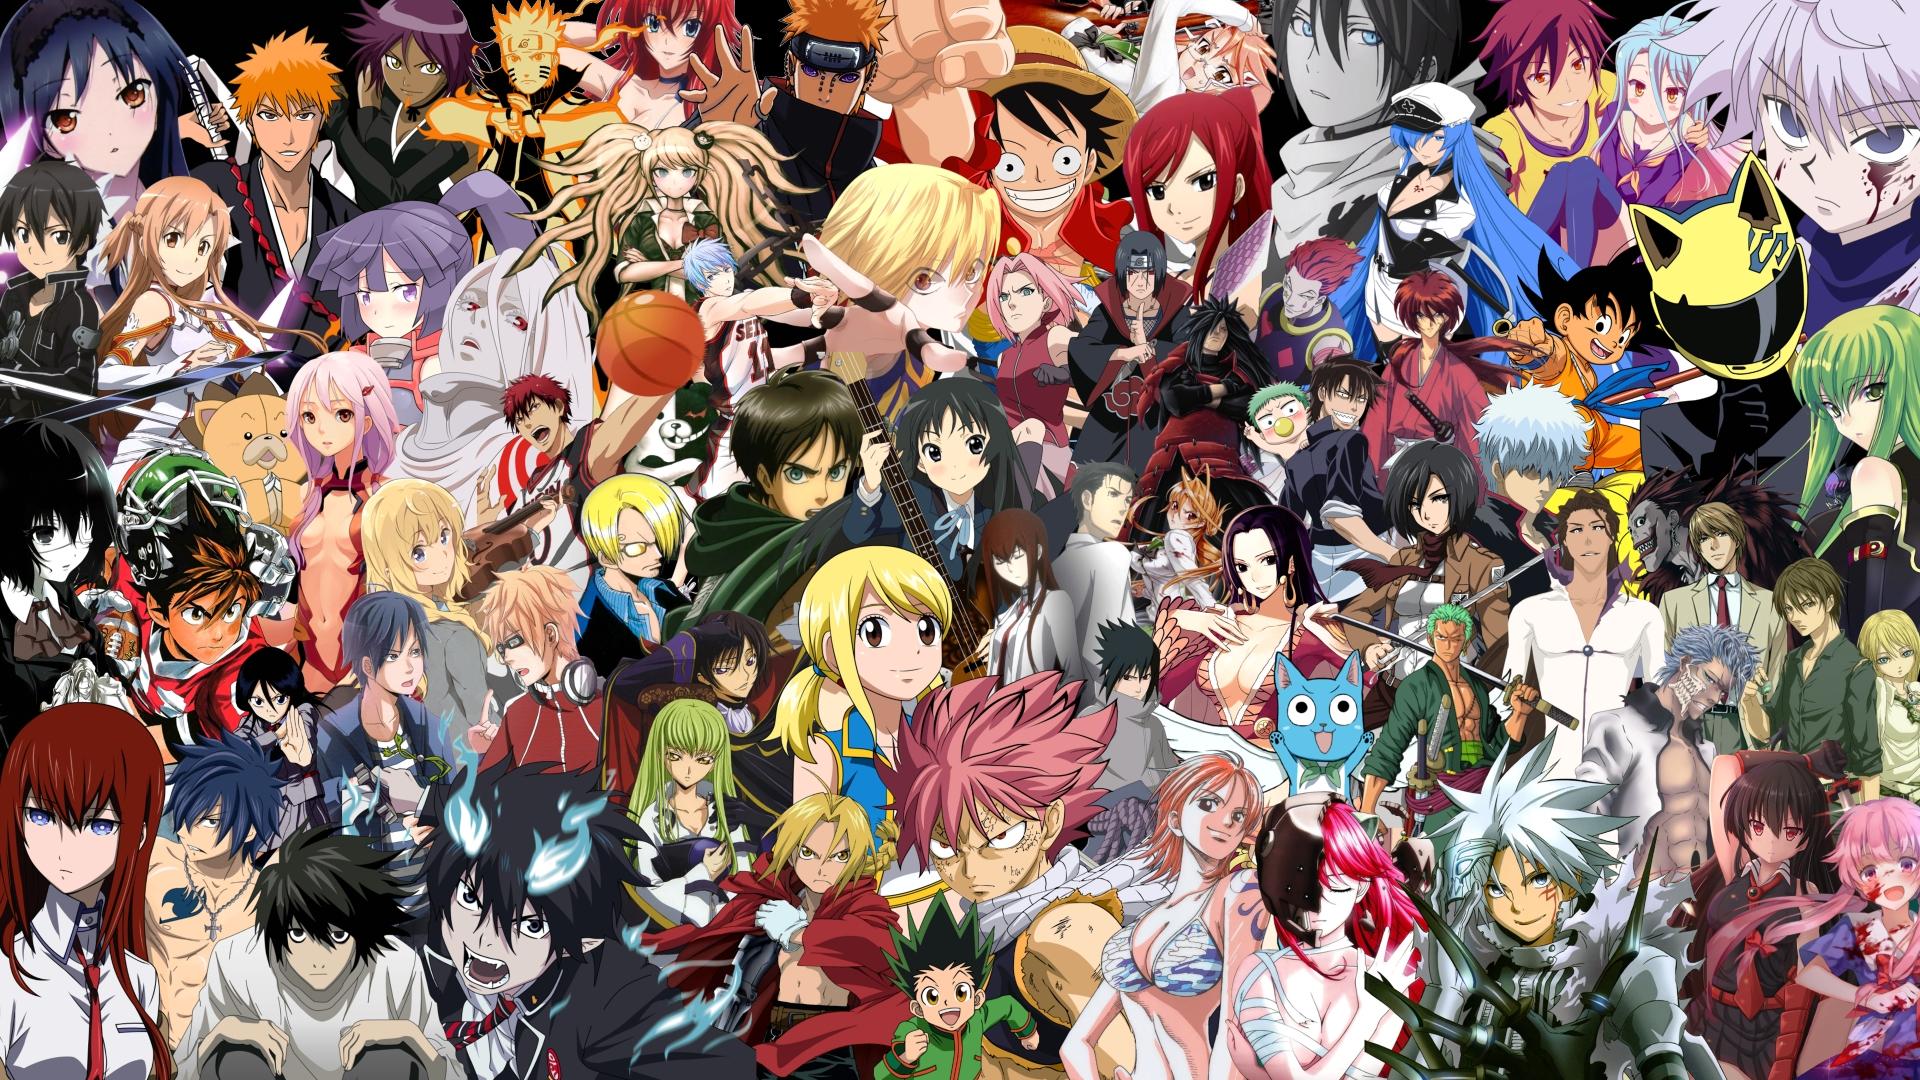 anime mix wallpaper (anime wallpaper 8k) 8k ultra hd wallpaper and